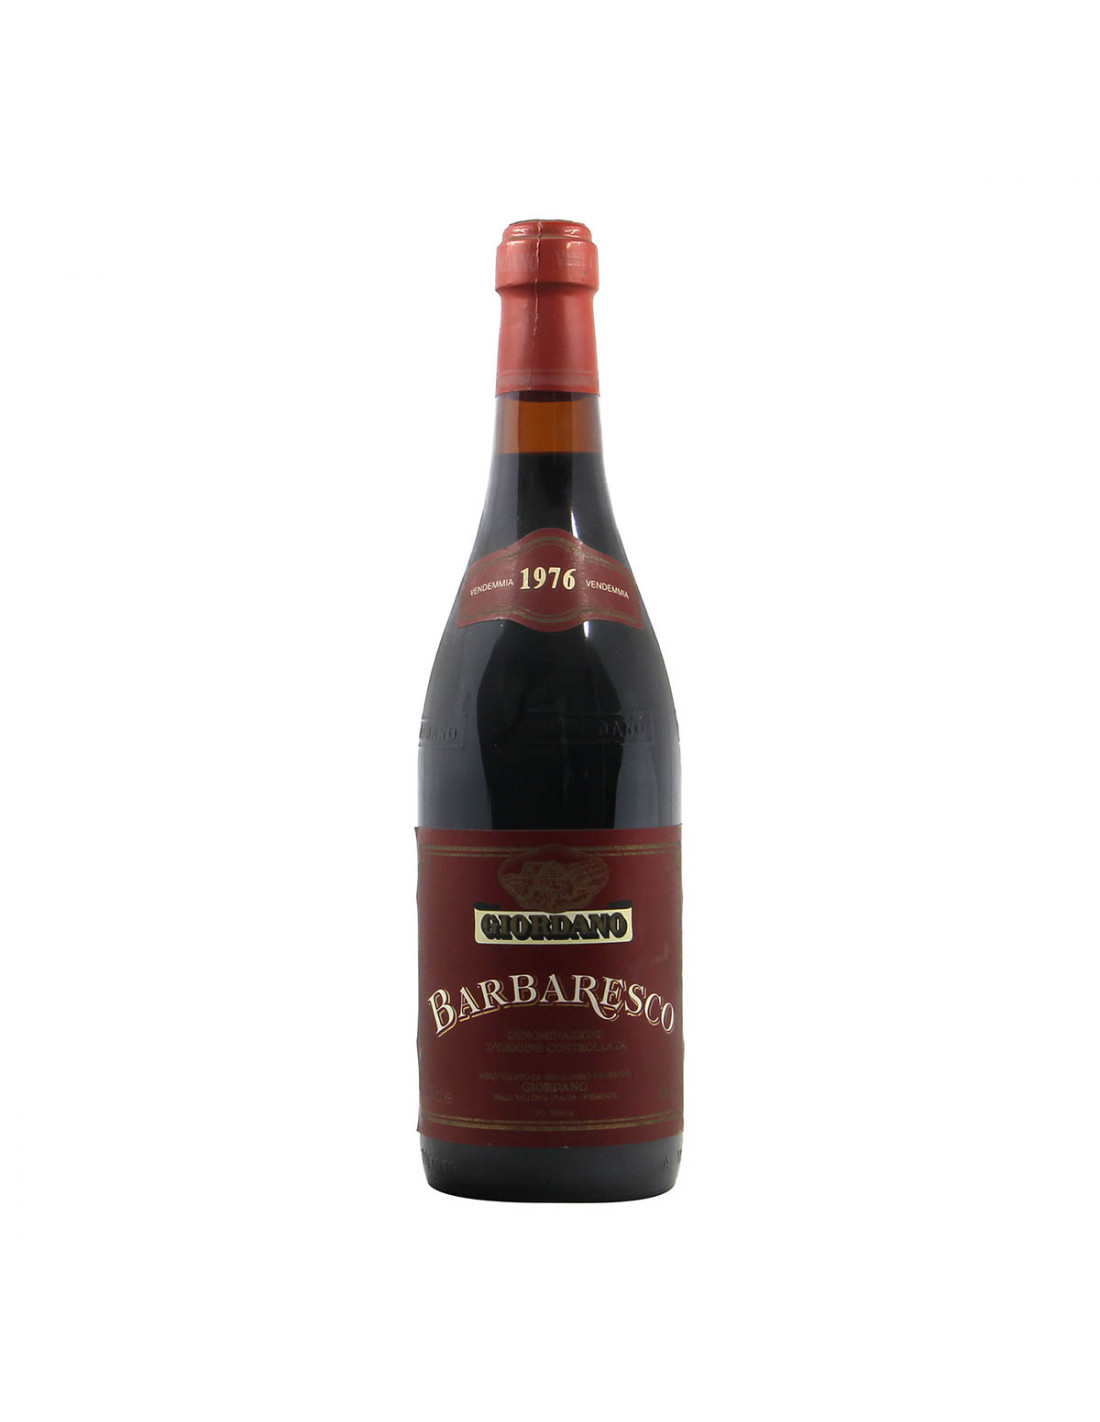 Giordano Barbaresco 1976